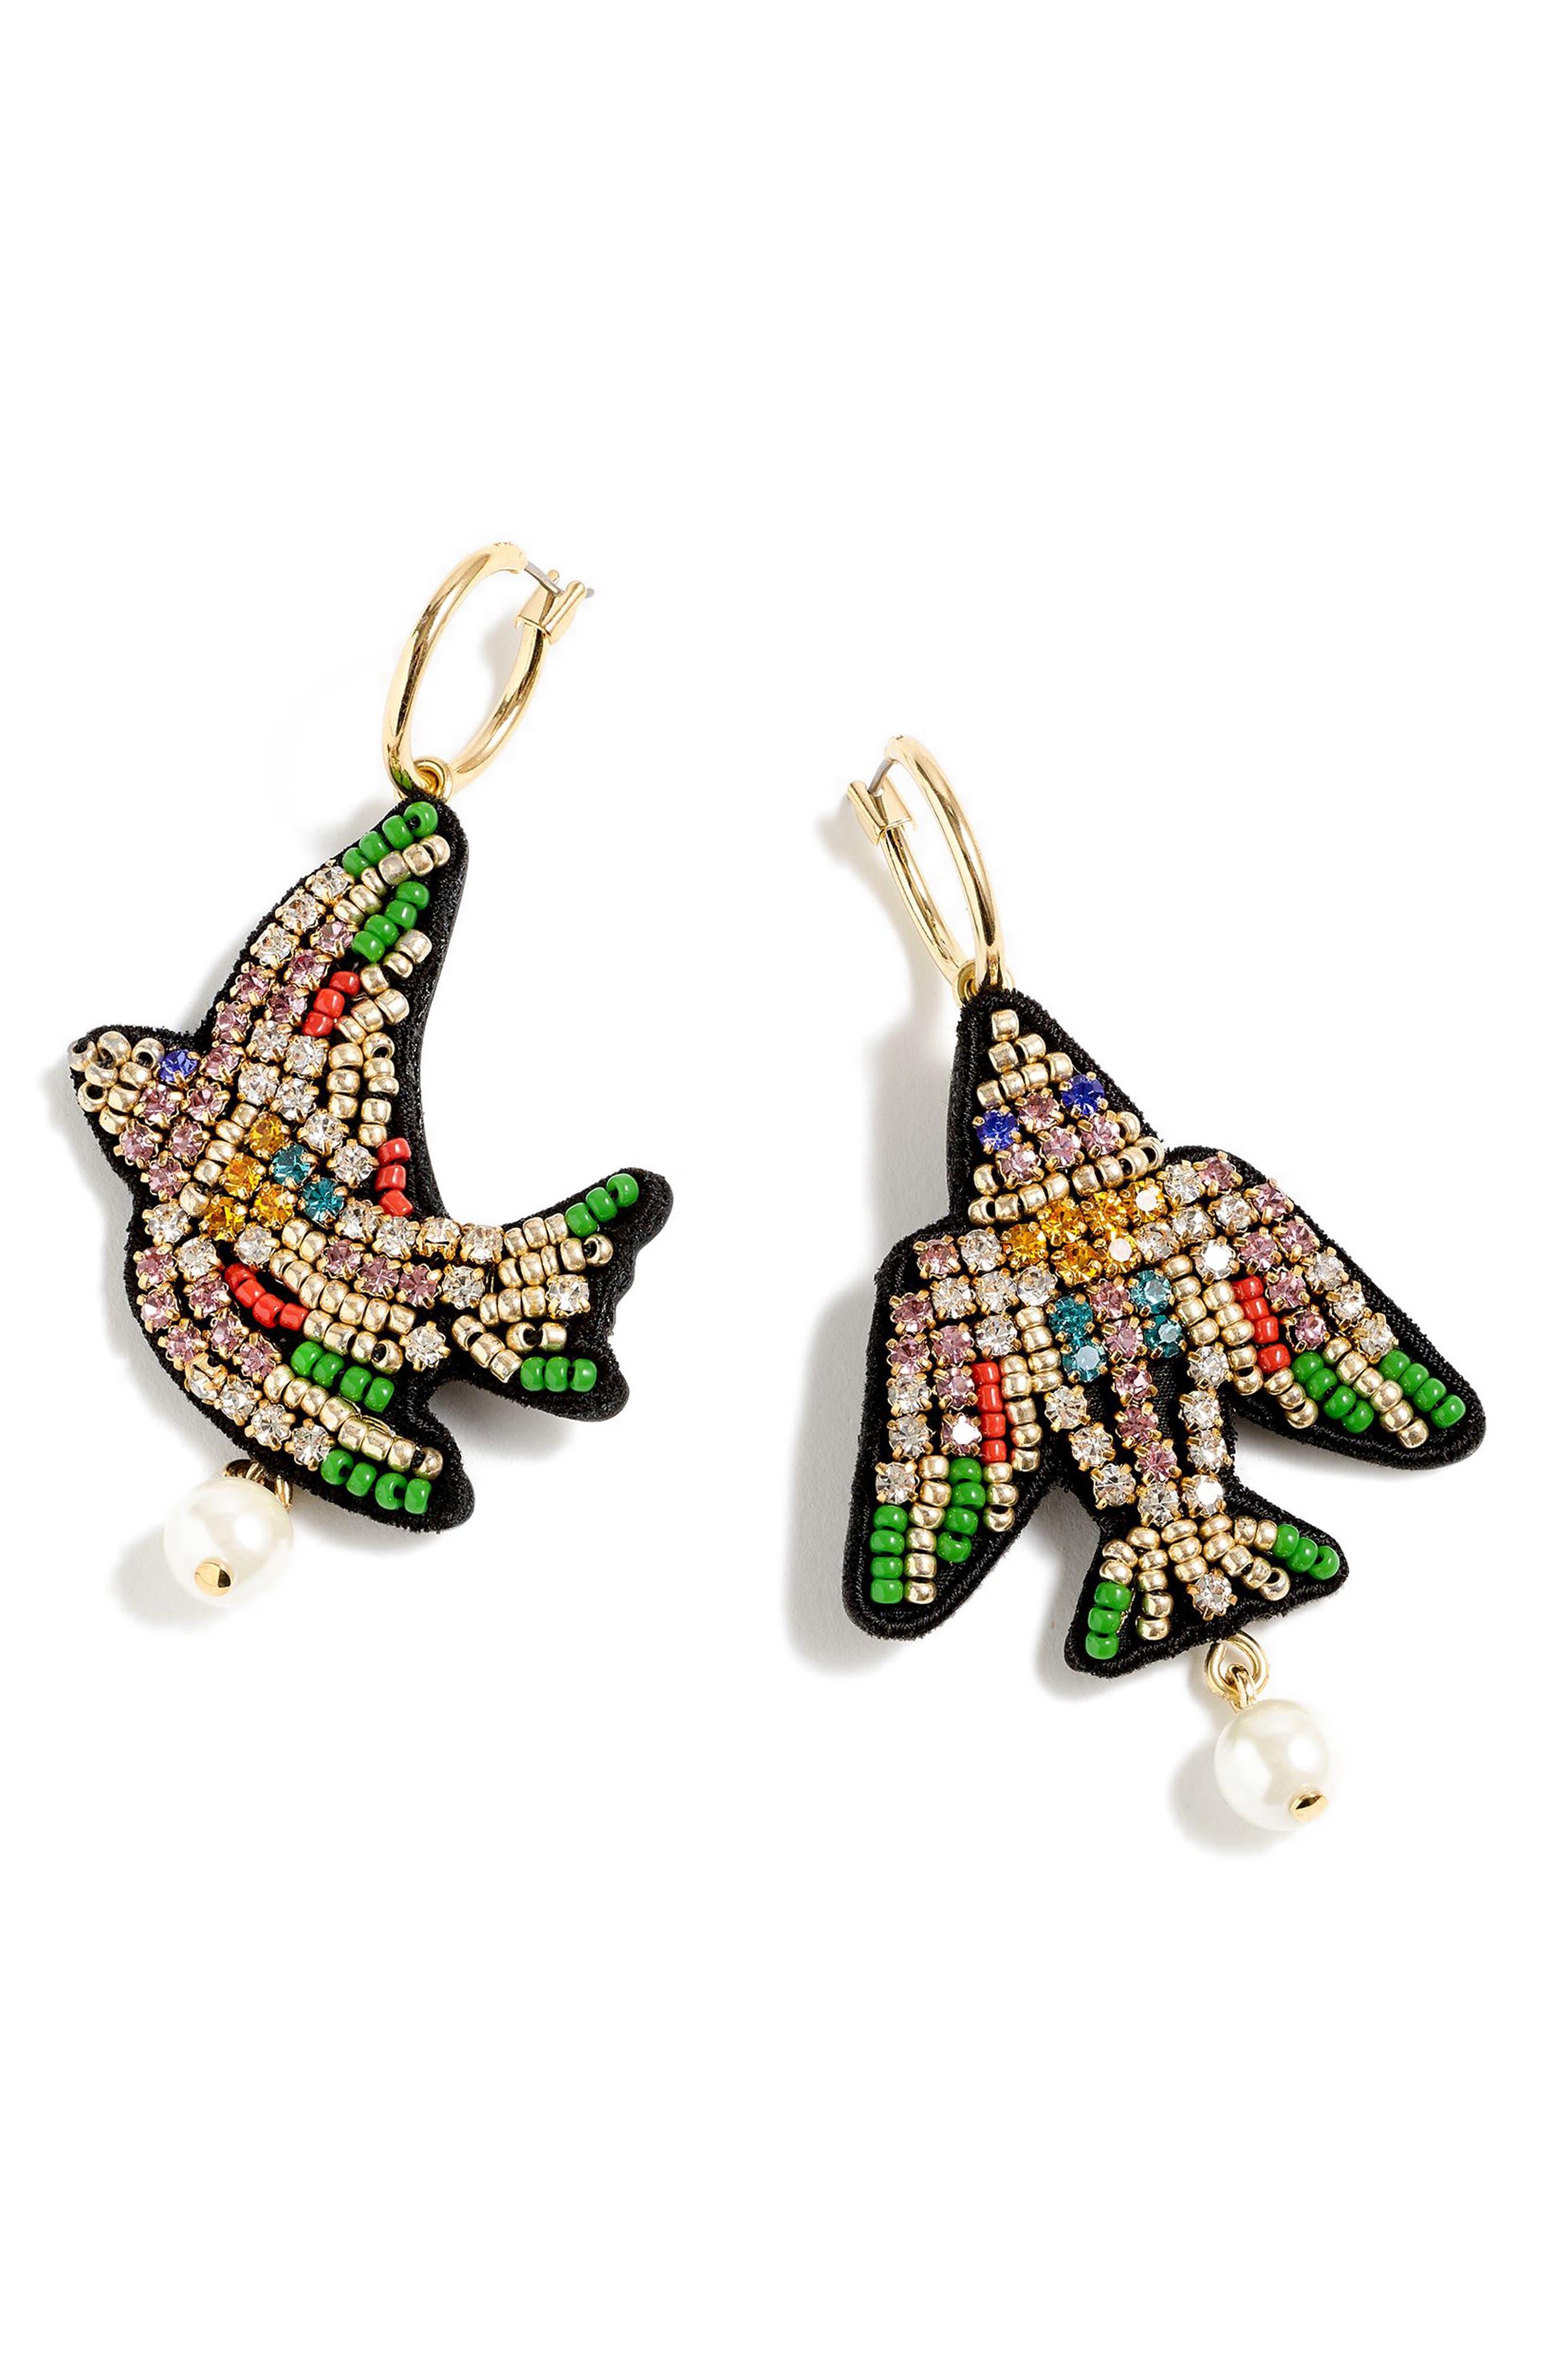 Leather-Backed Beaded Bird Earrings,                             Main thumbnail 1, color,                             GREEN MULTI